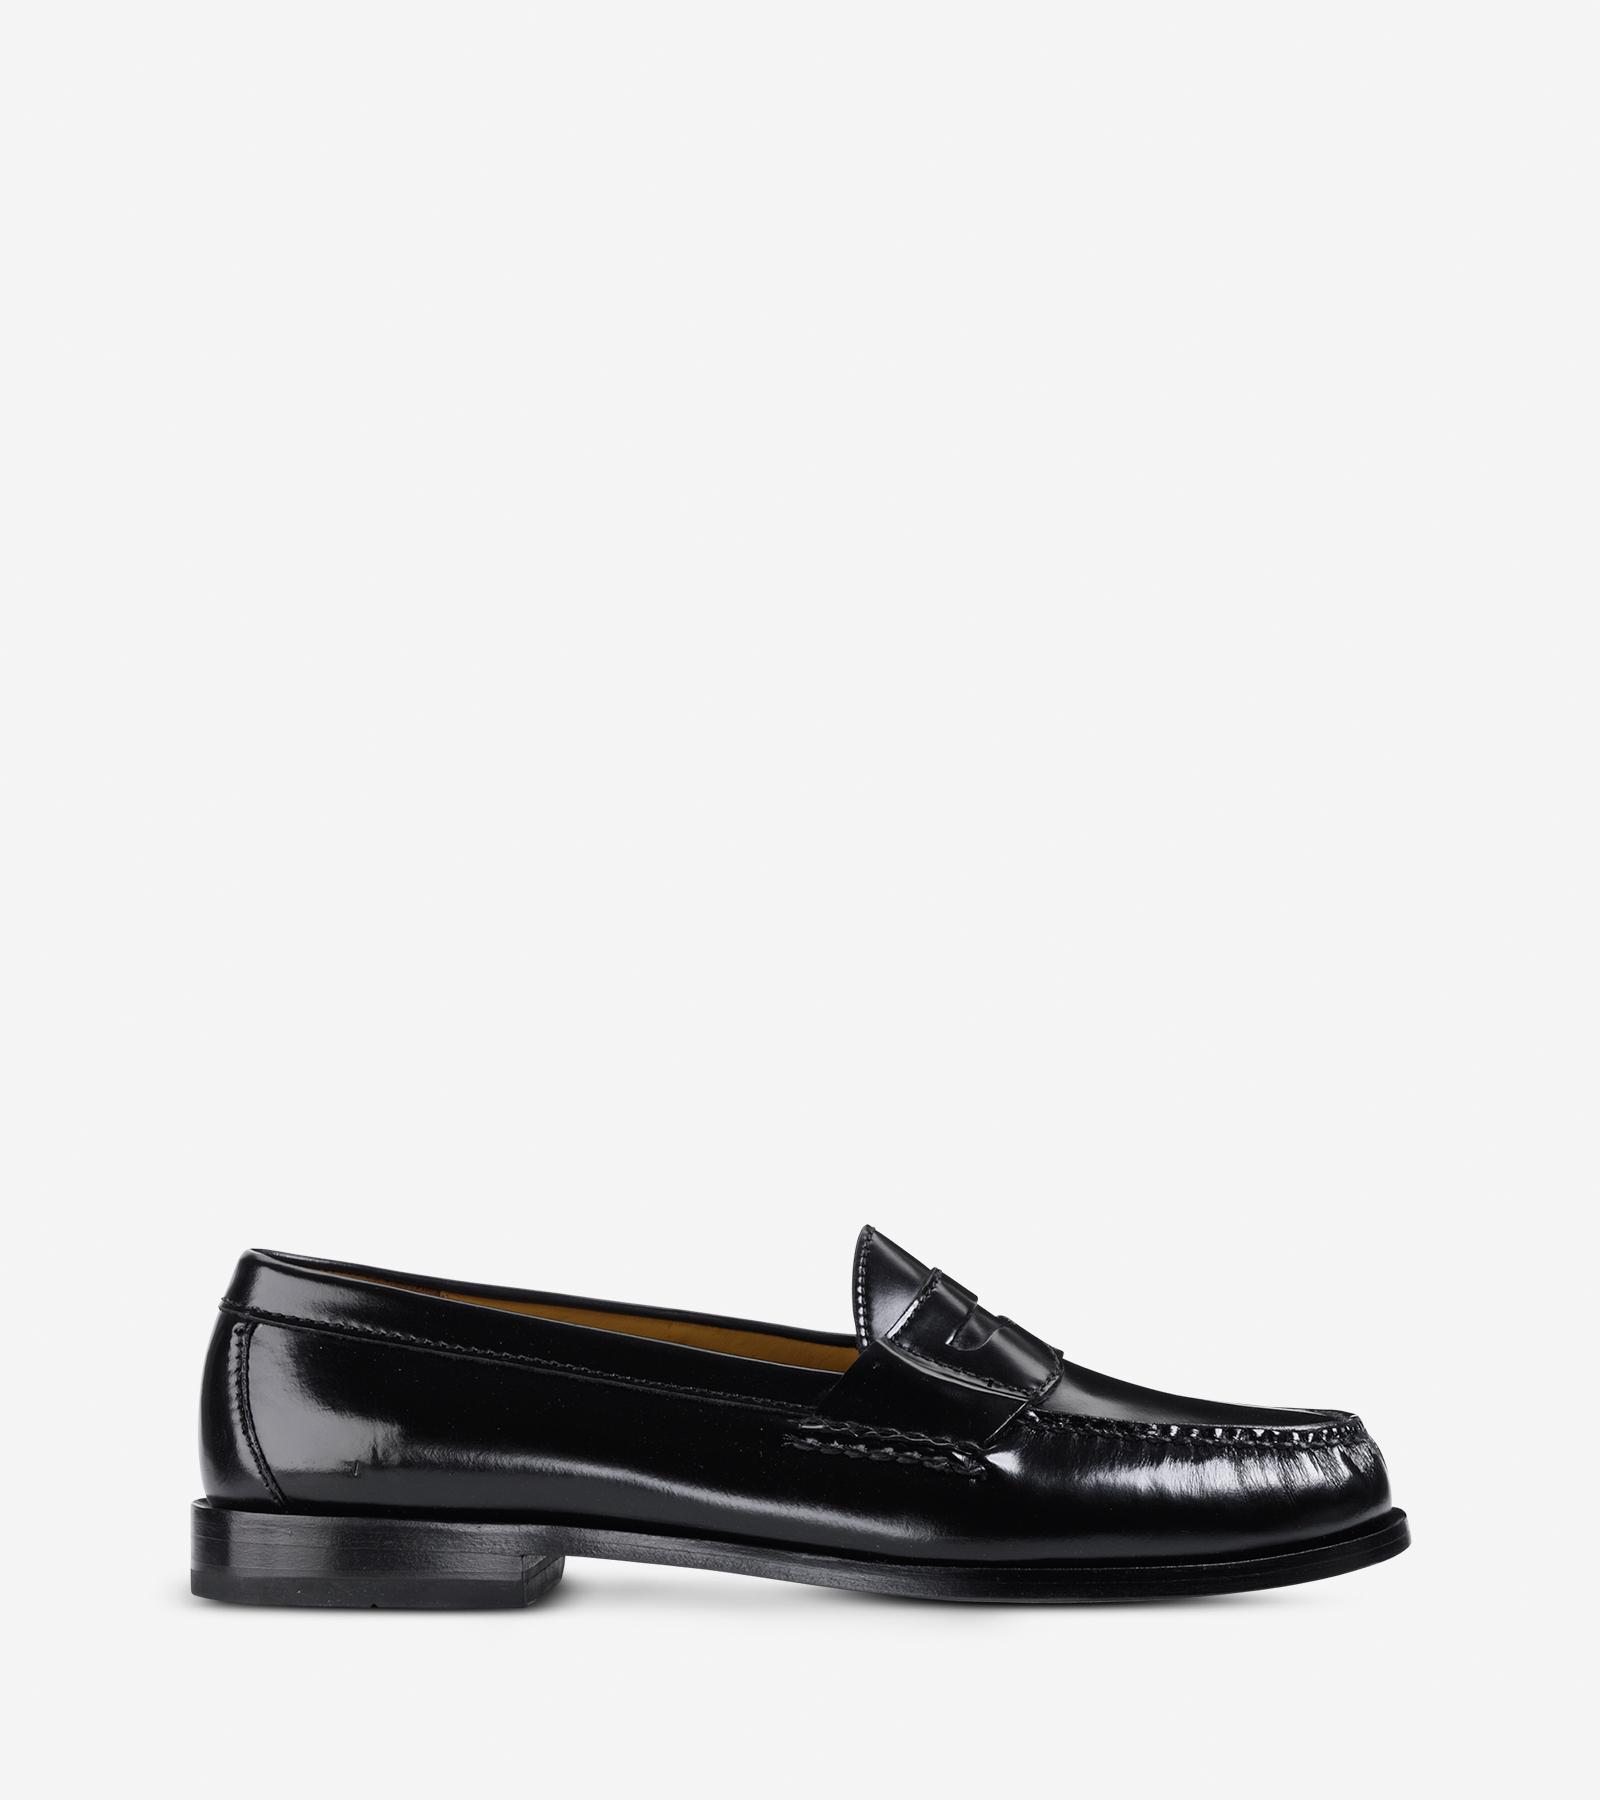 Men's Pinch Penny Loafers in Black